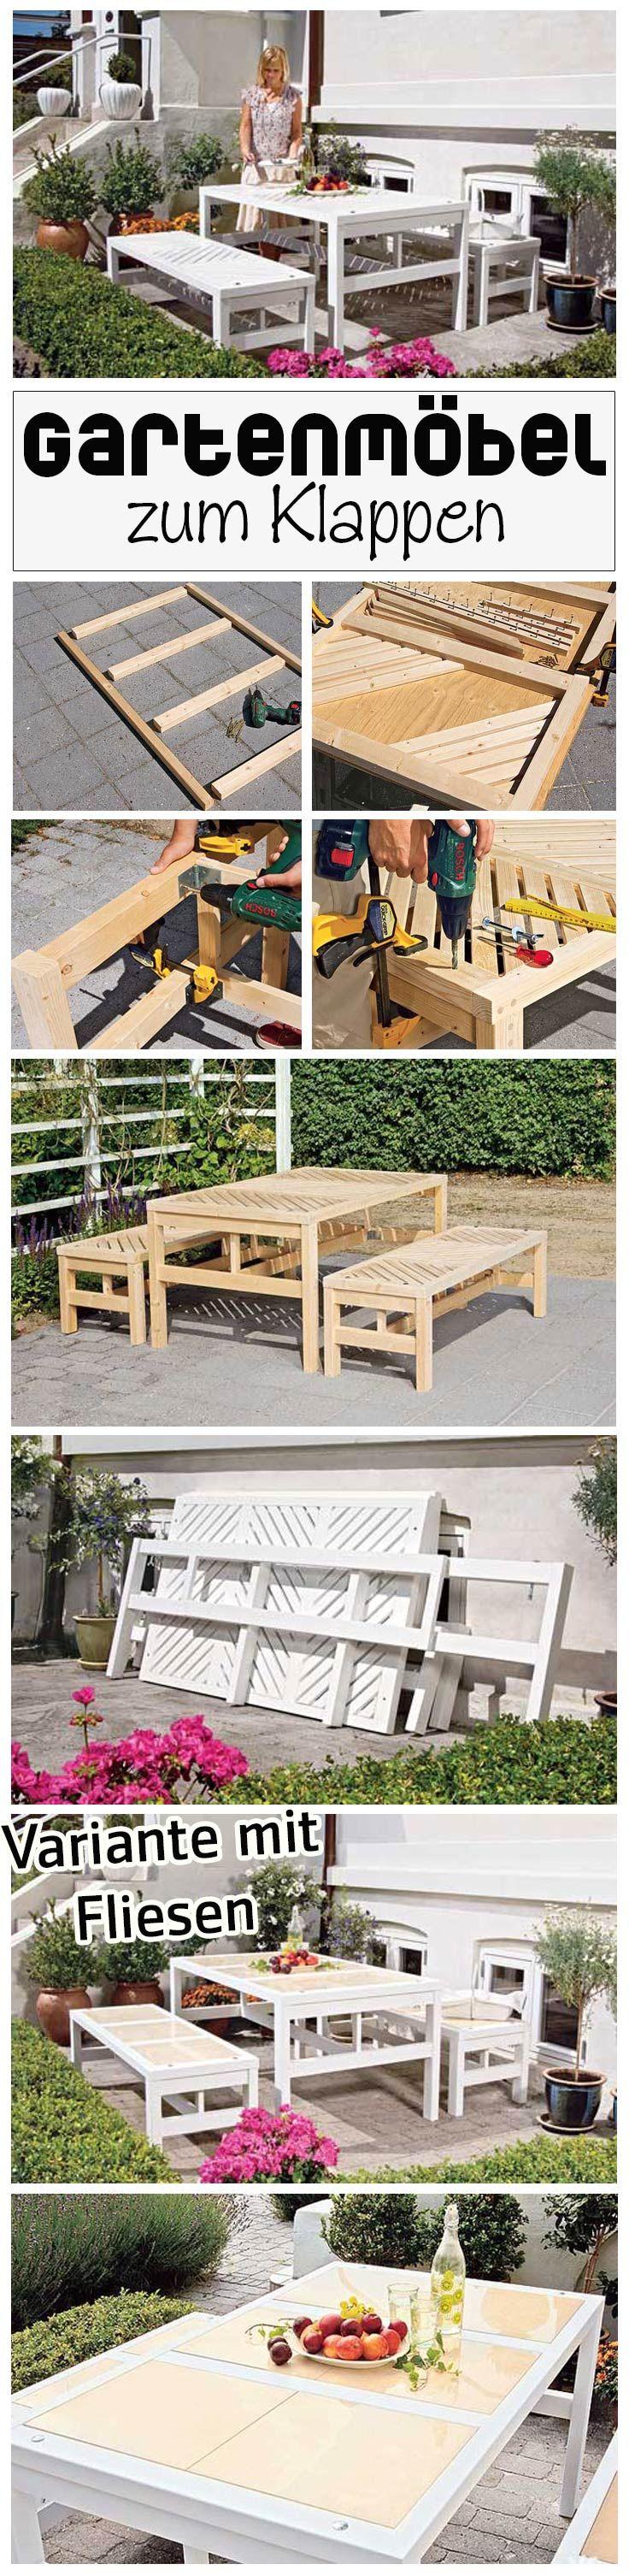 Gartenmöbel Zum Klappen